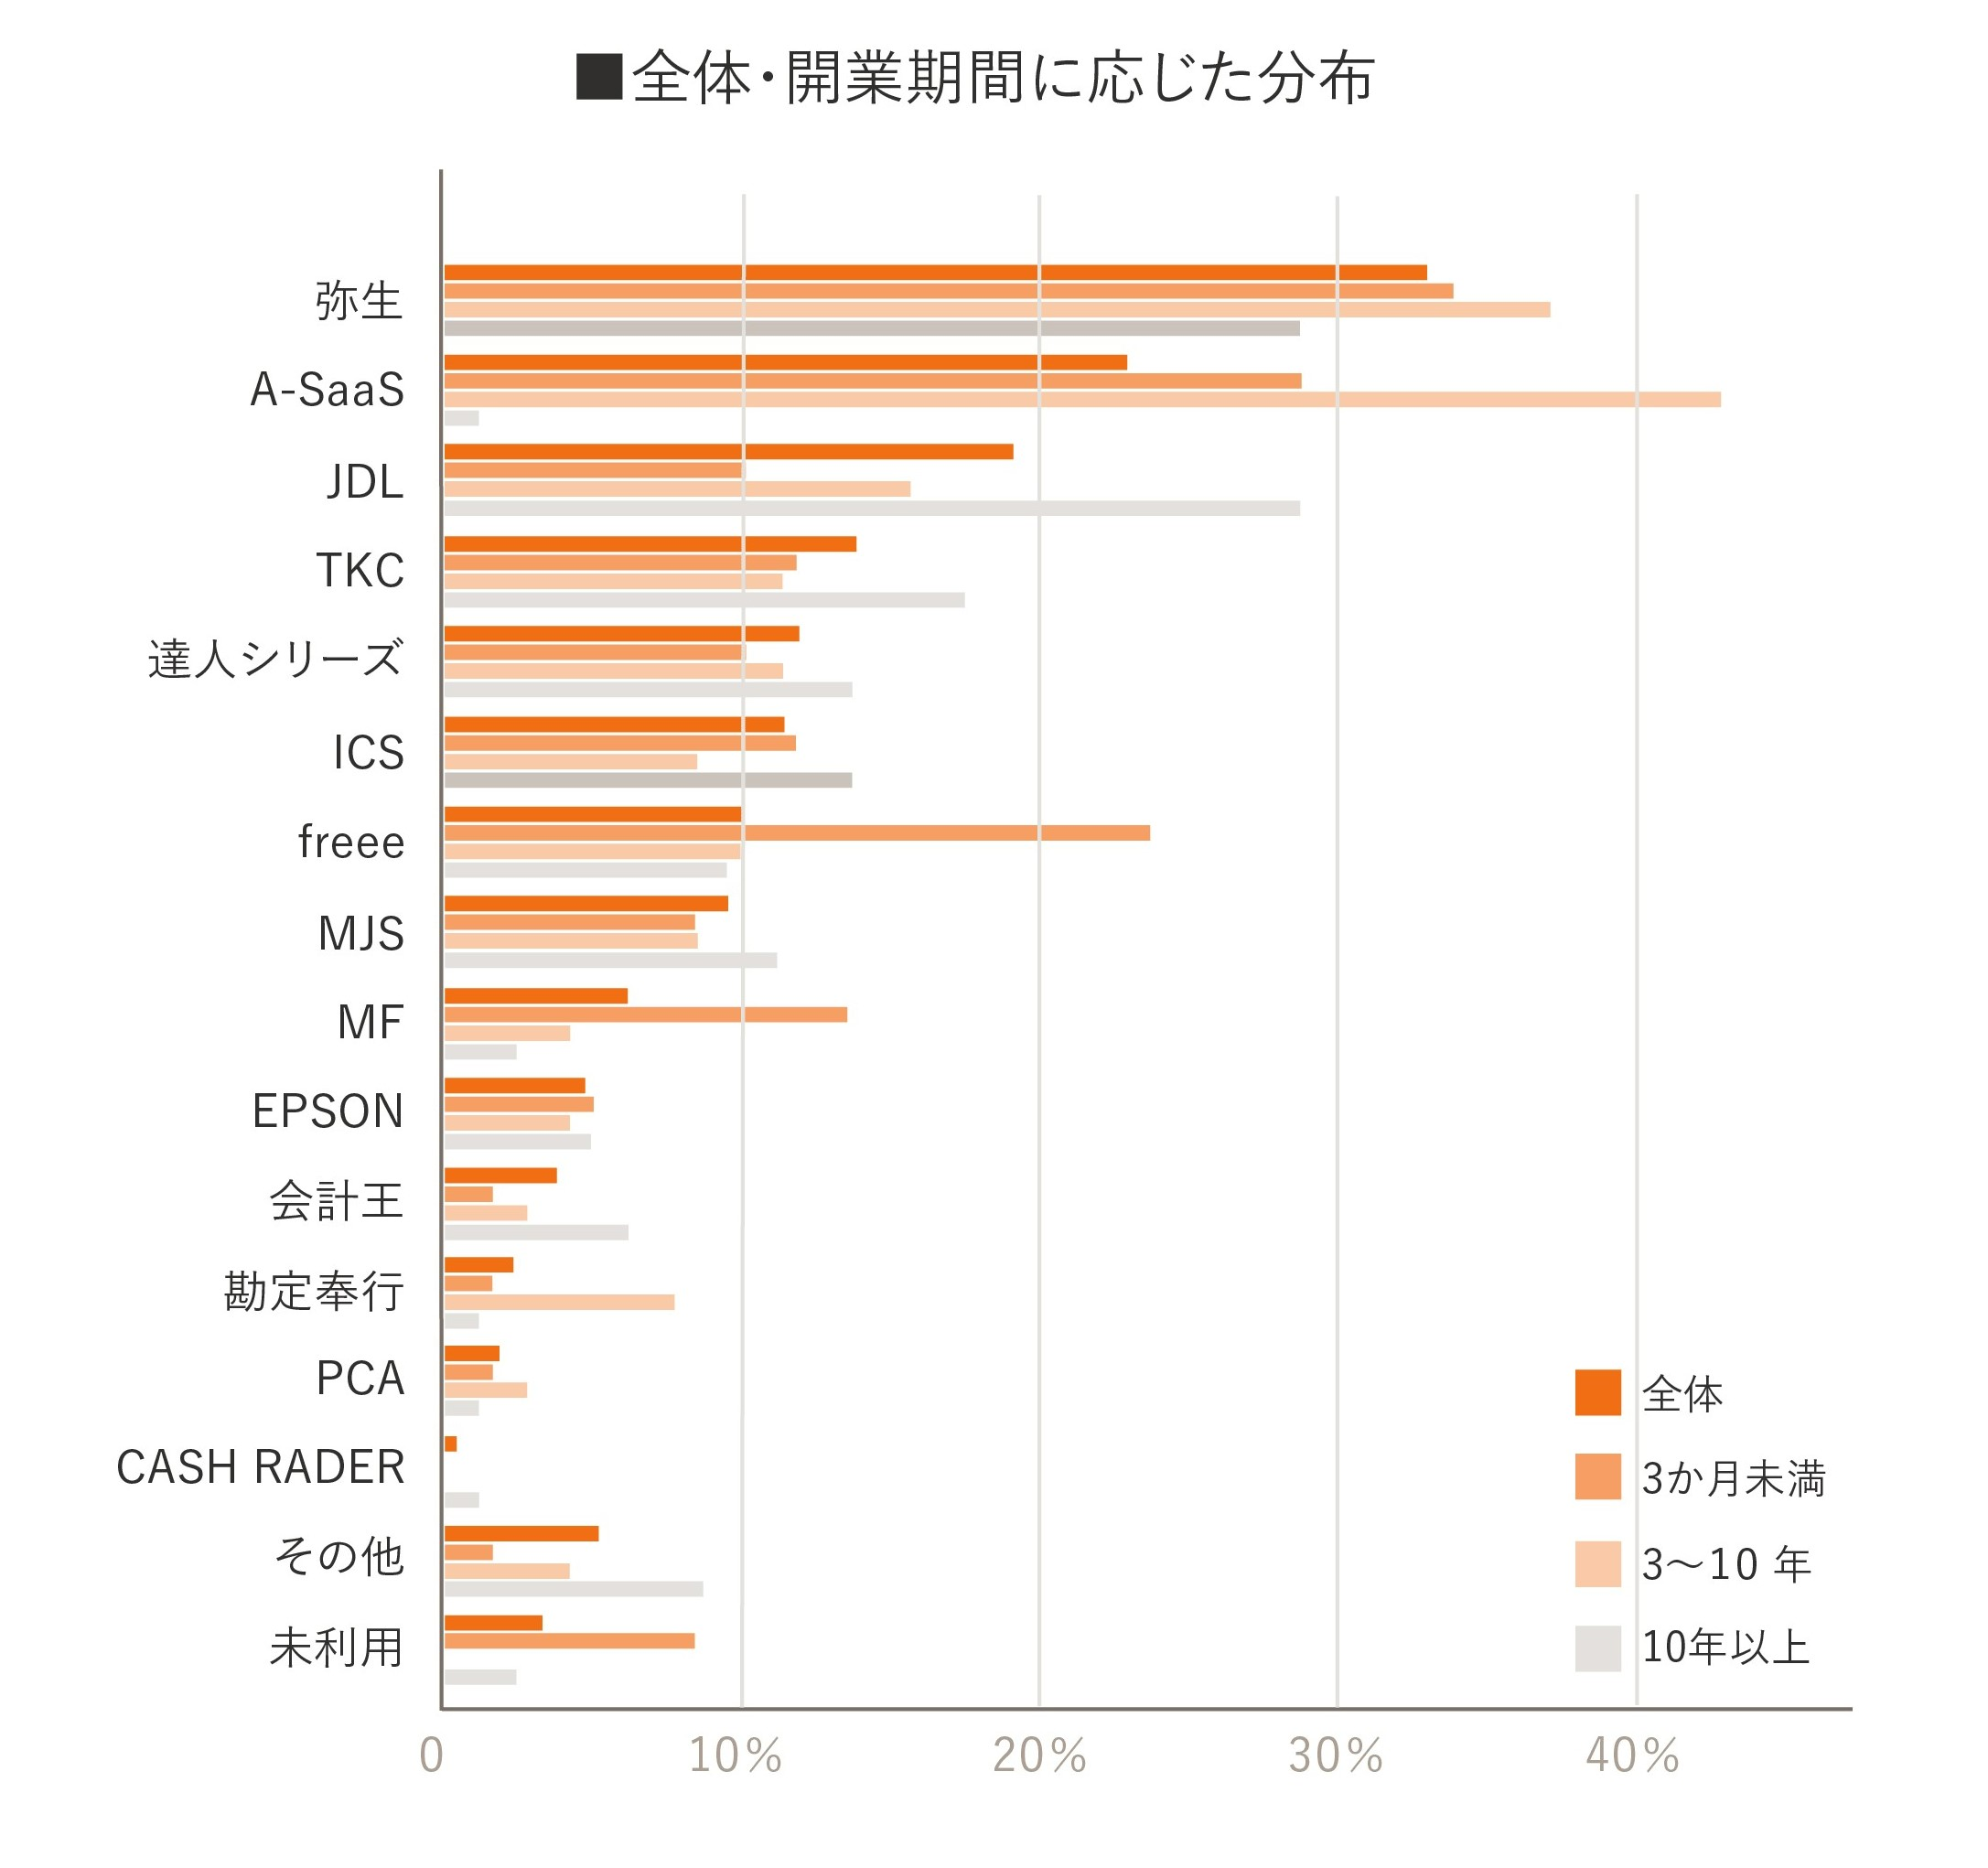 独立開業実態調査グラフ15